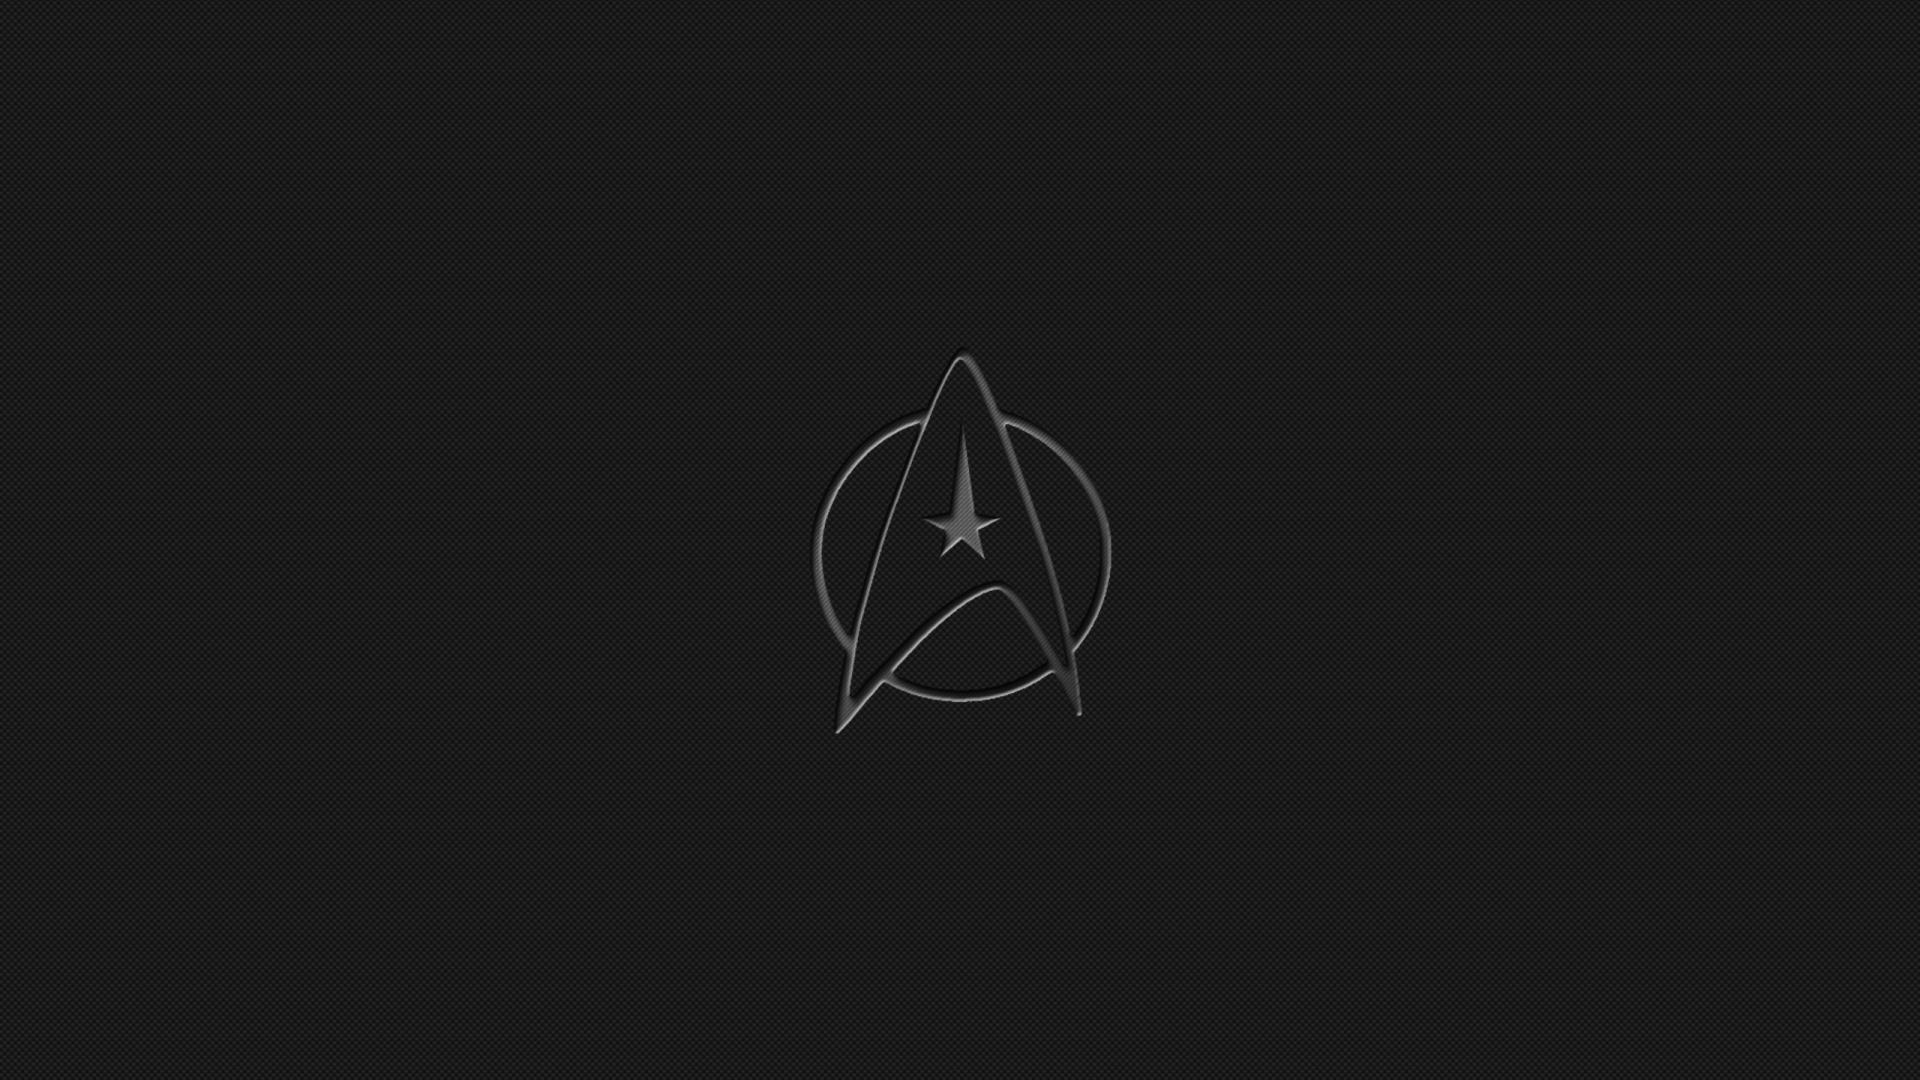 Star Trek Poster Enterprise Minimalist By Adriansfinalfrontier Star Trek Poster Star Trek Tattoo Star Trek Art